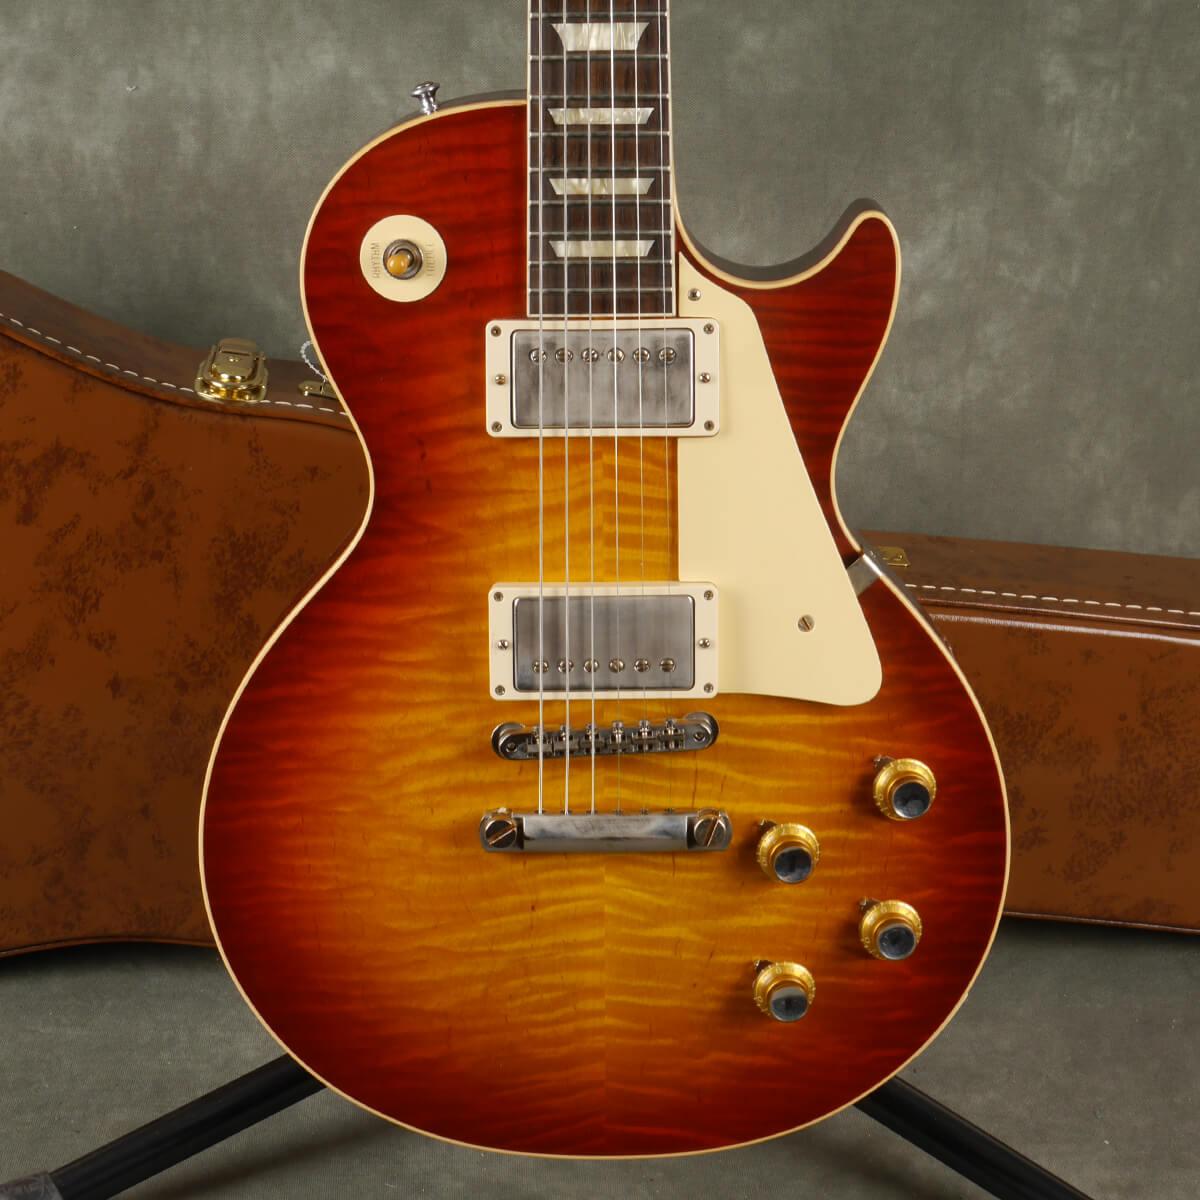 Gibson Custom Shop Les Paul 1960 VOS - Tomato Burst w/Hard Case - 2nd Hand